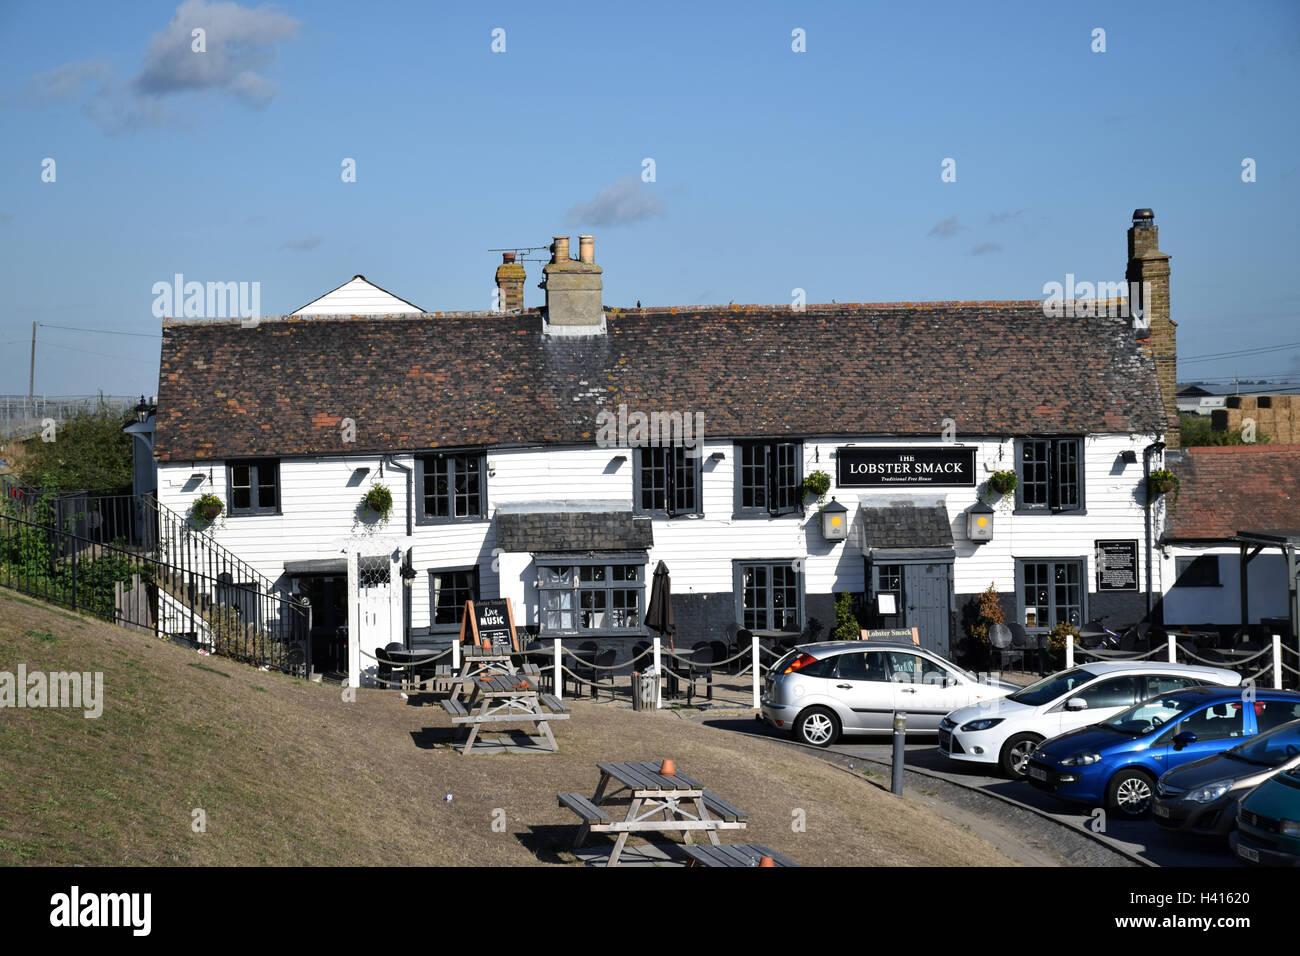 Canvey Island, Essex UK - Lobster Shack pub - Stock Image